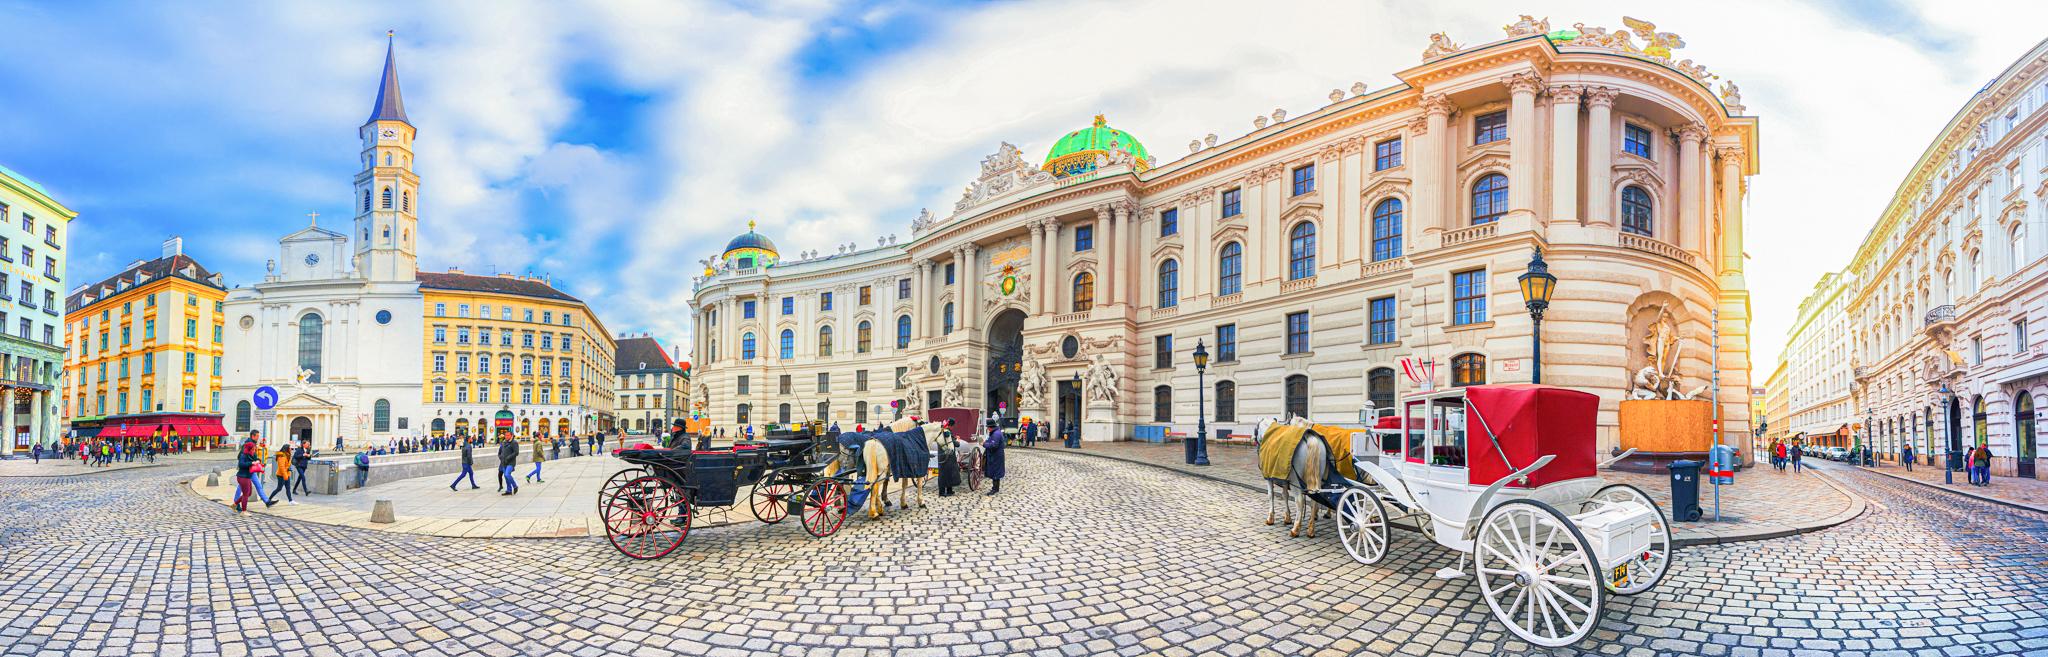 The Royal Palace of Hofburg in Vienna. Photo by Georgios Tsichlis